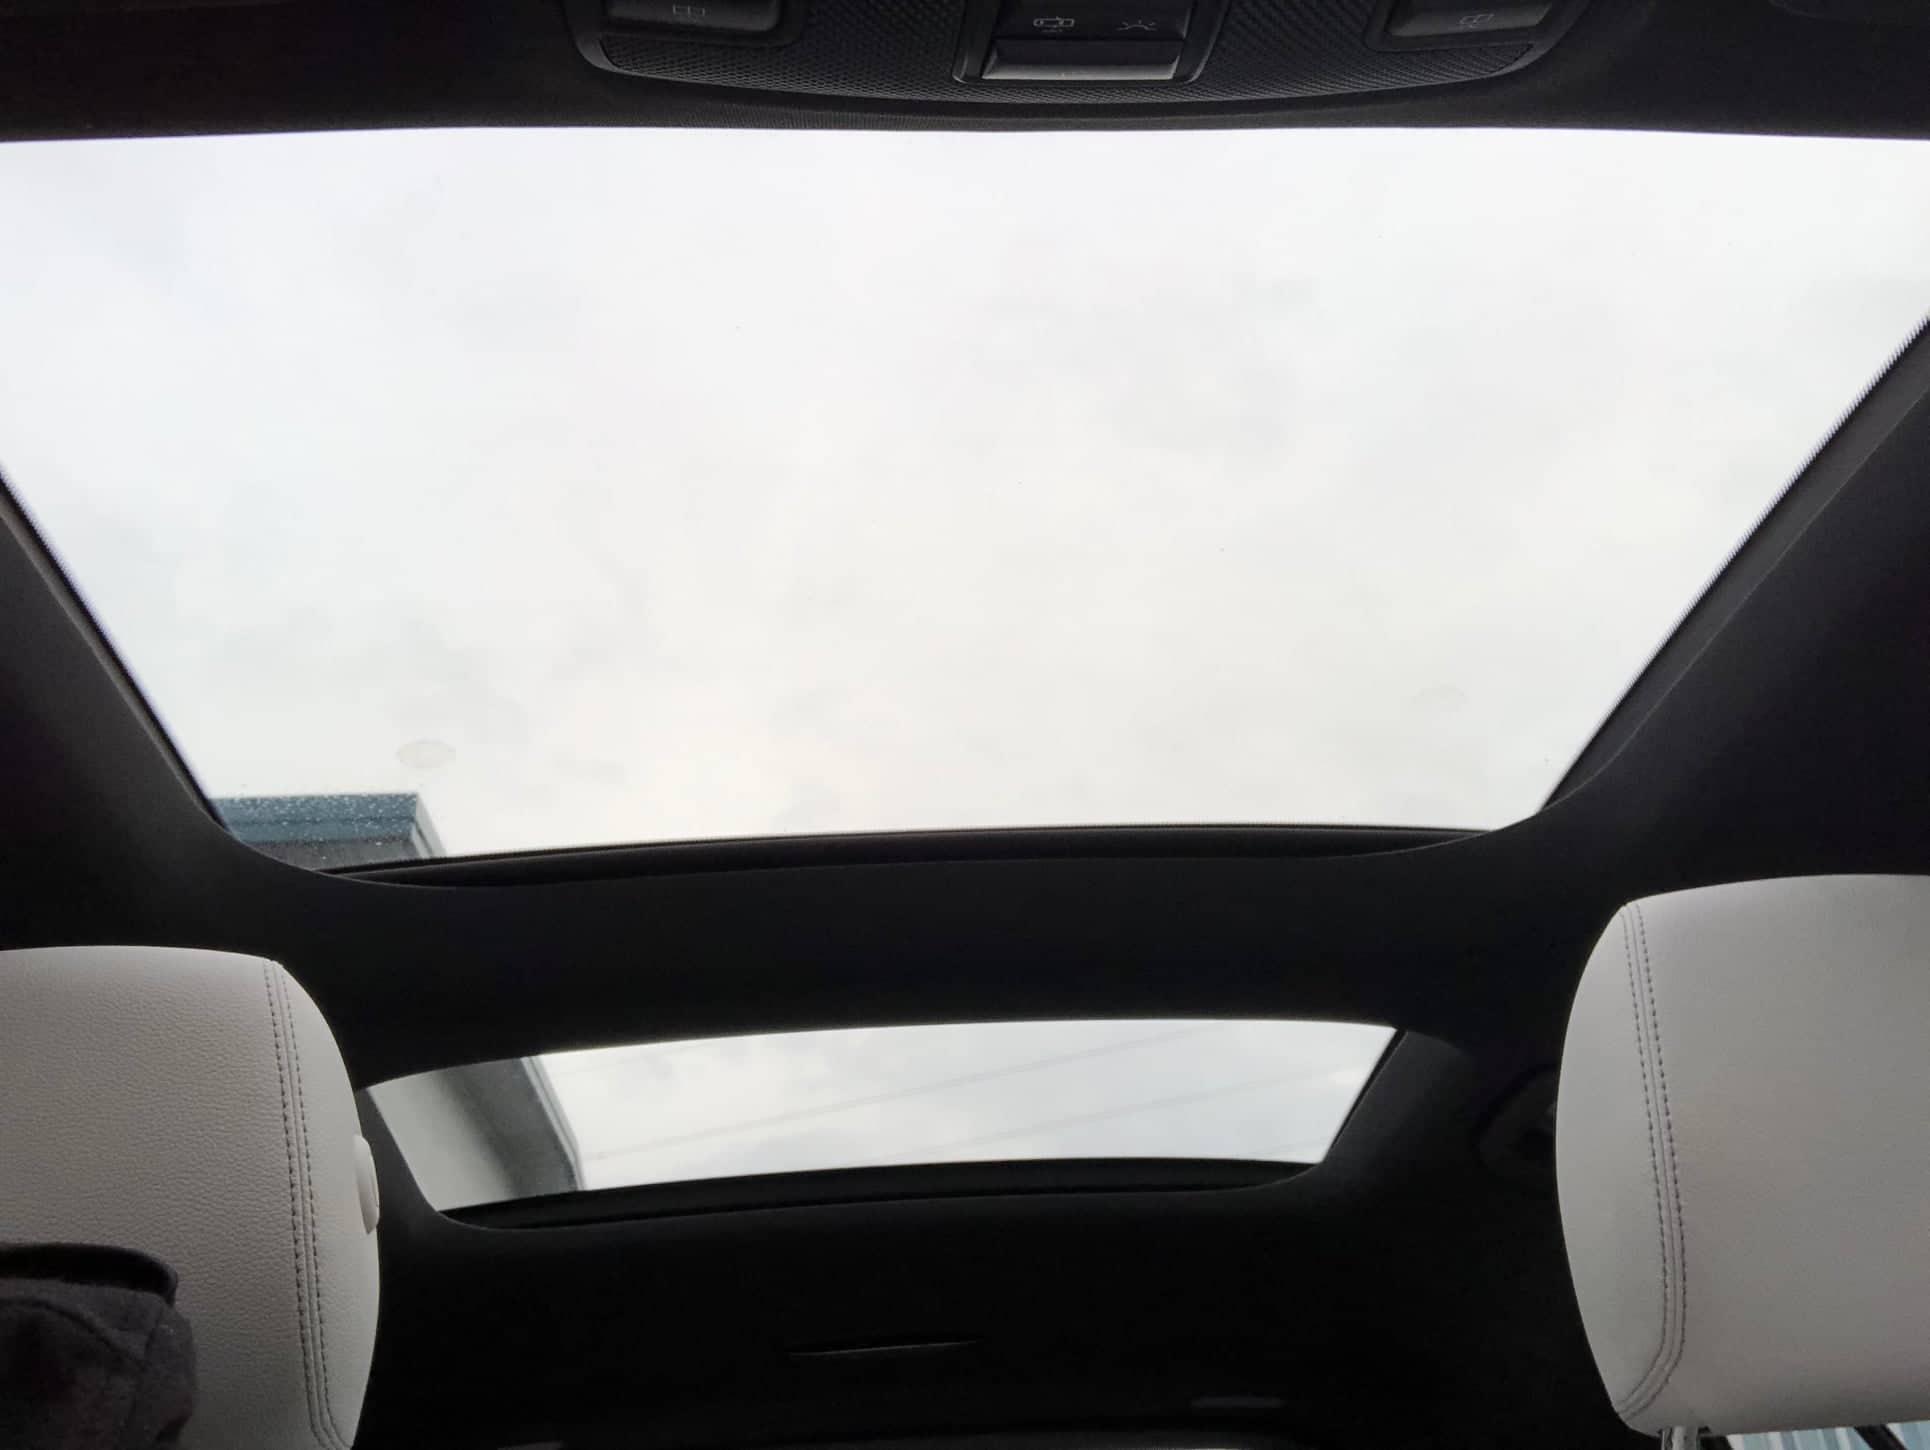 MERCEDES BENZ GLA 200 D SPORT PREMIUM PLUS AUTO Hatchback